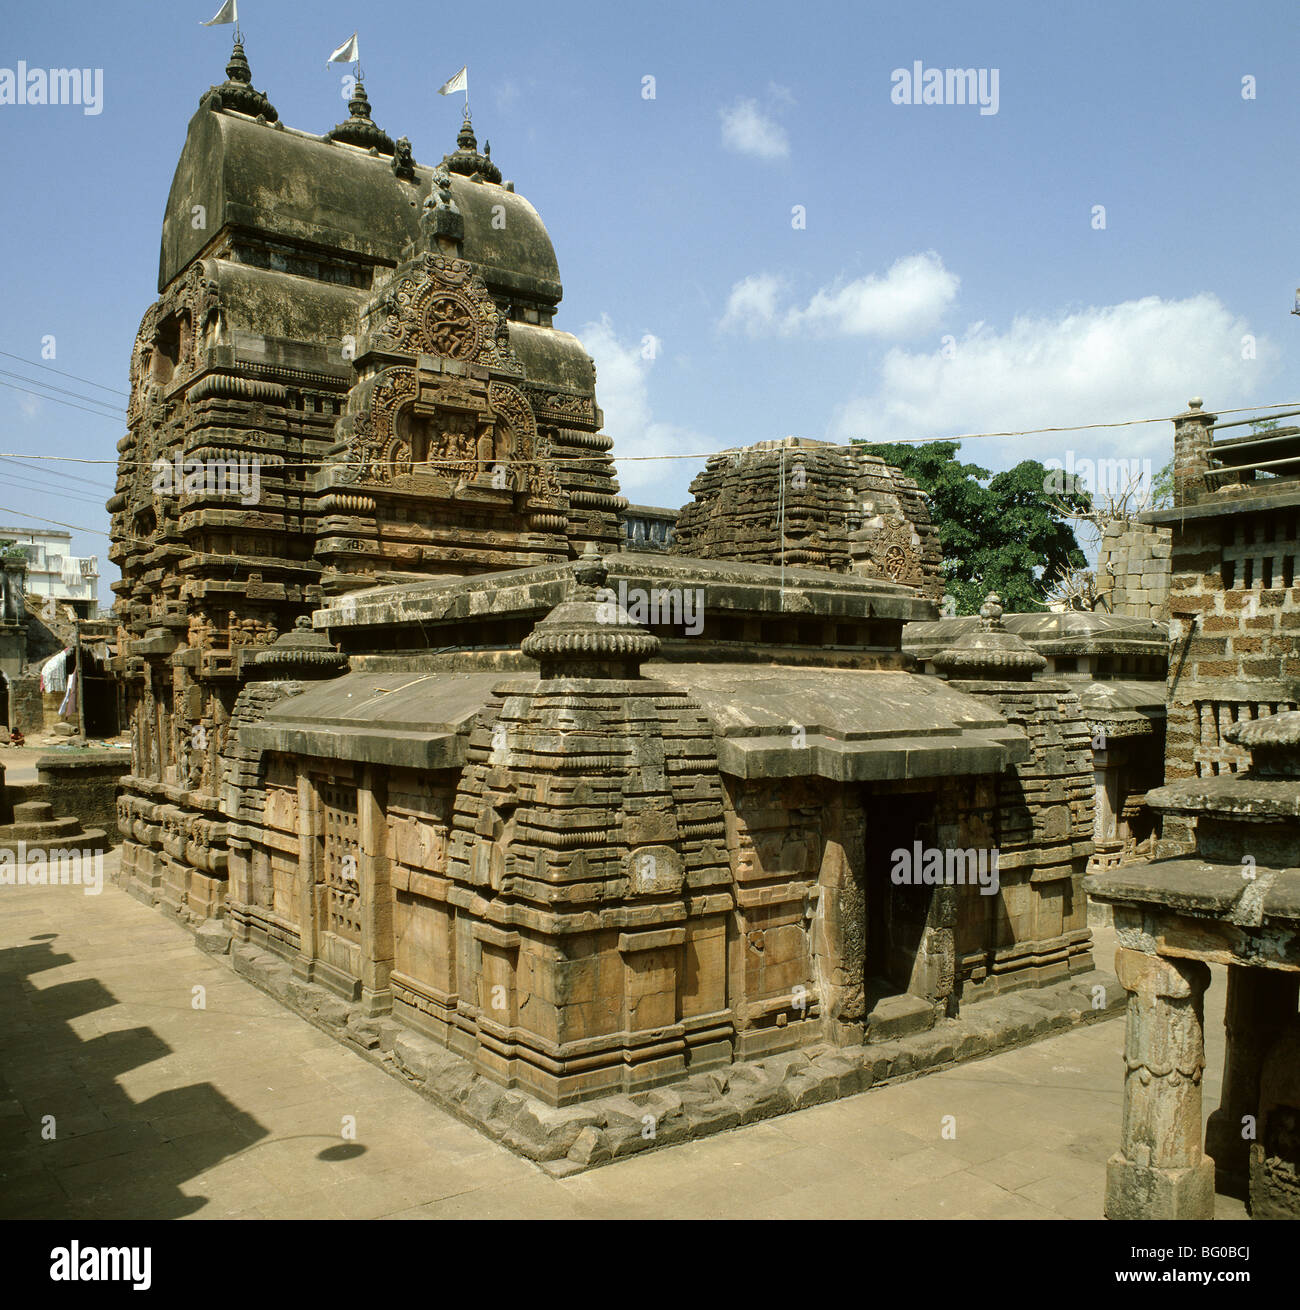 Vital Deul Temple at Bhubaneshwar, Orissa, India, Asia - Stock Image